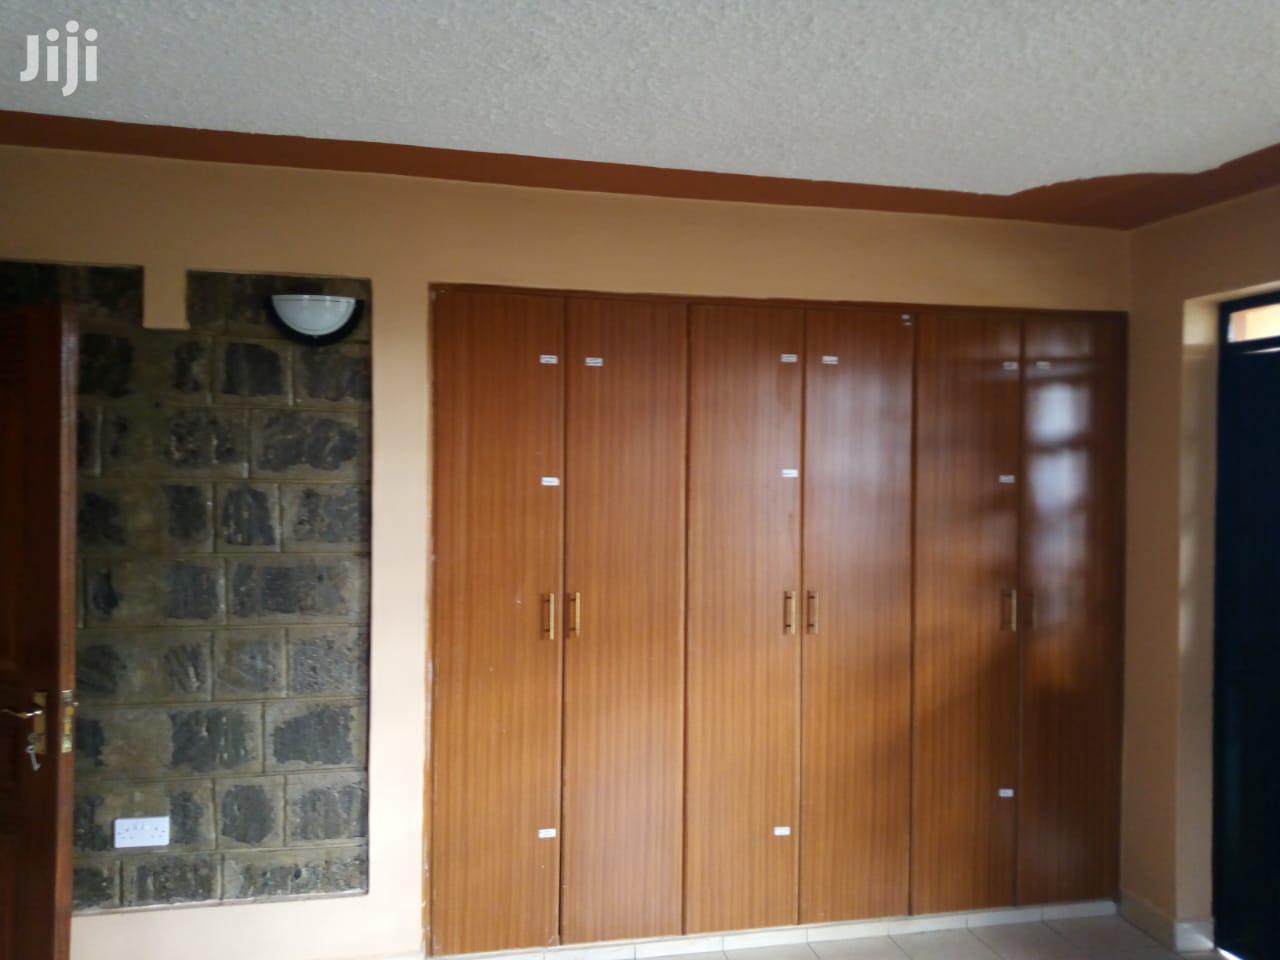 Massionet House On Sale Kitengela Accasia | Houses & Apartments For Sale for sale in Kitengela, Kajiado, Kenya